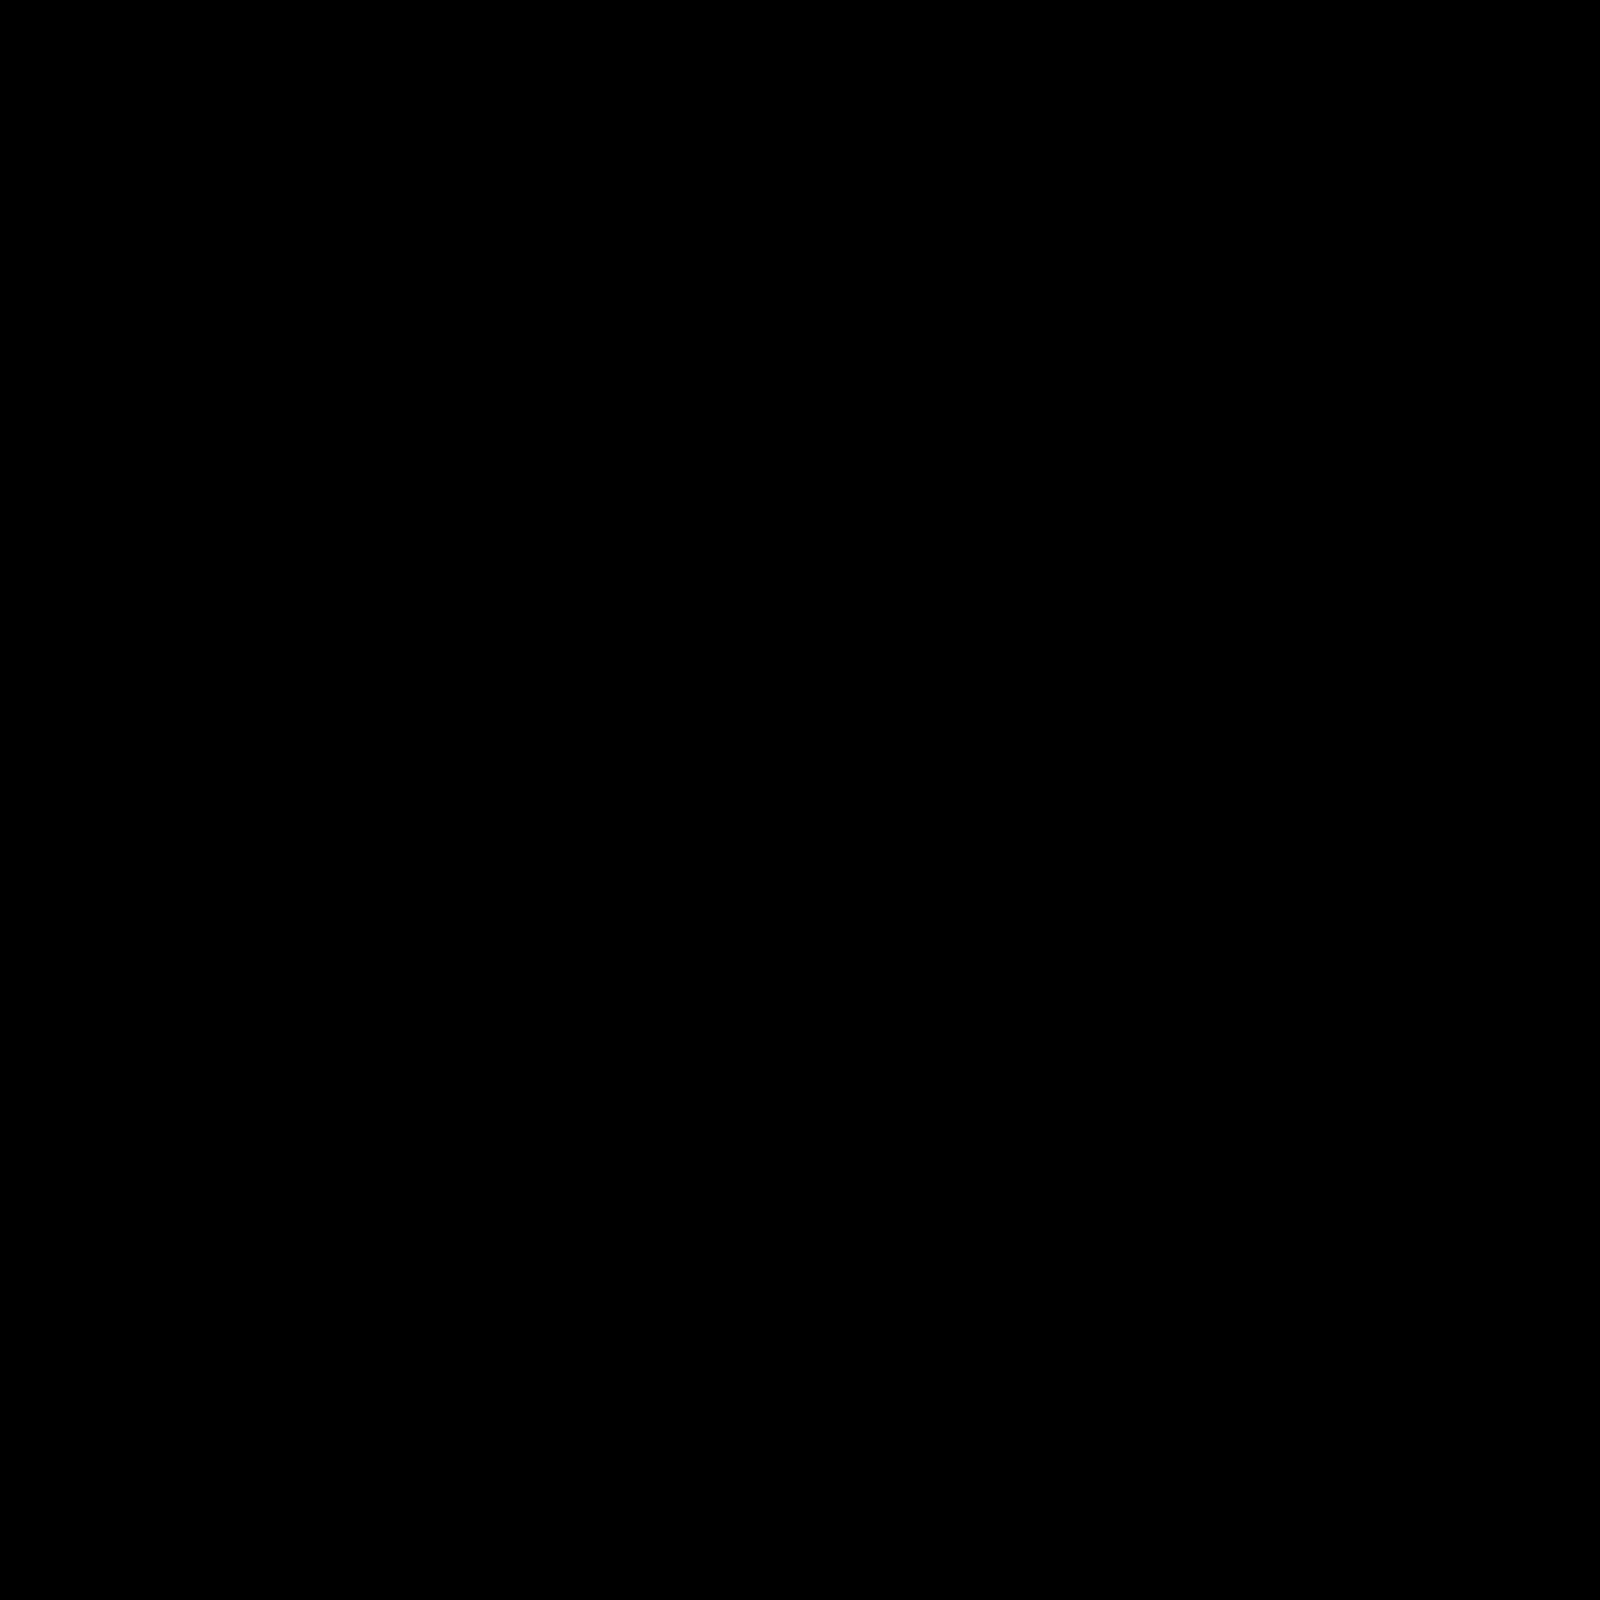 vector freeuse library Vector door round. Handle icon free download